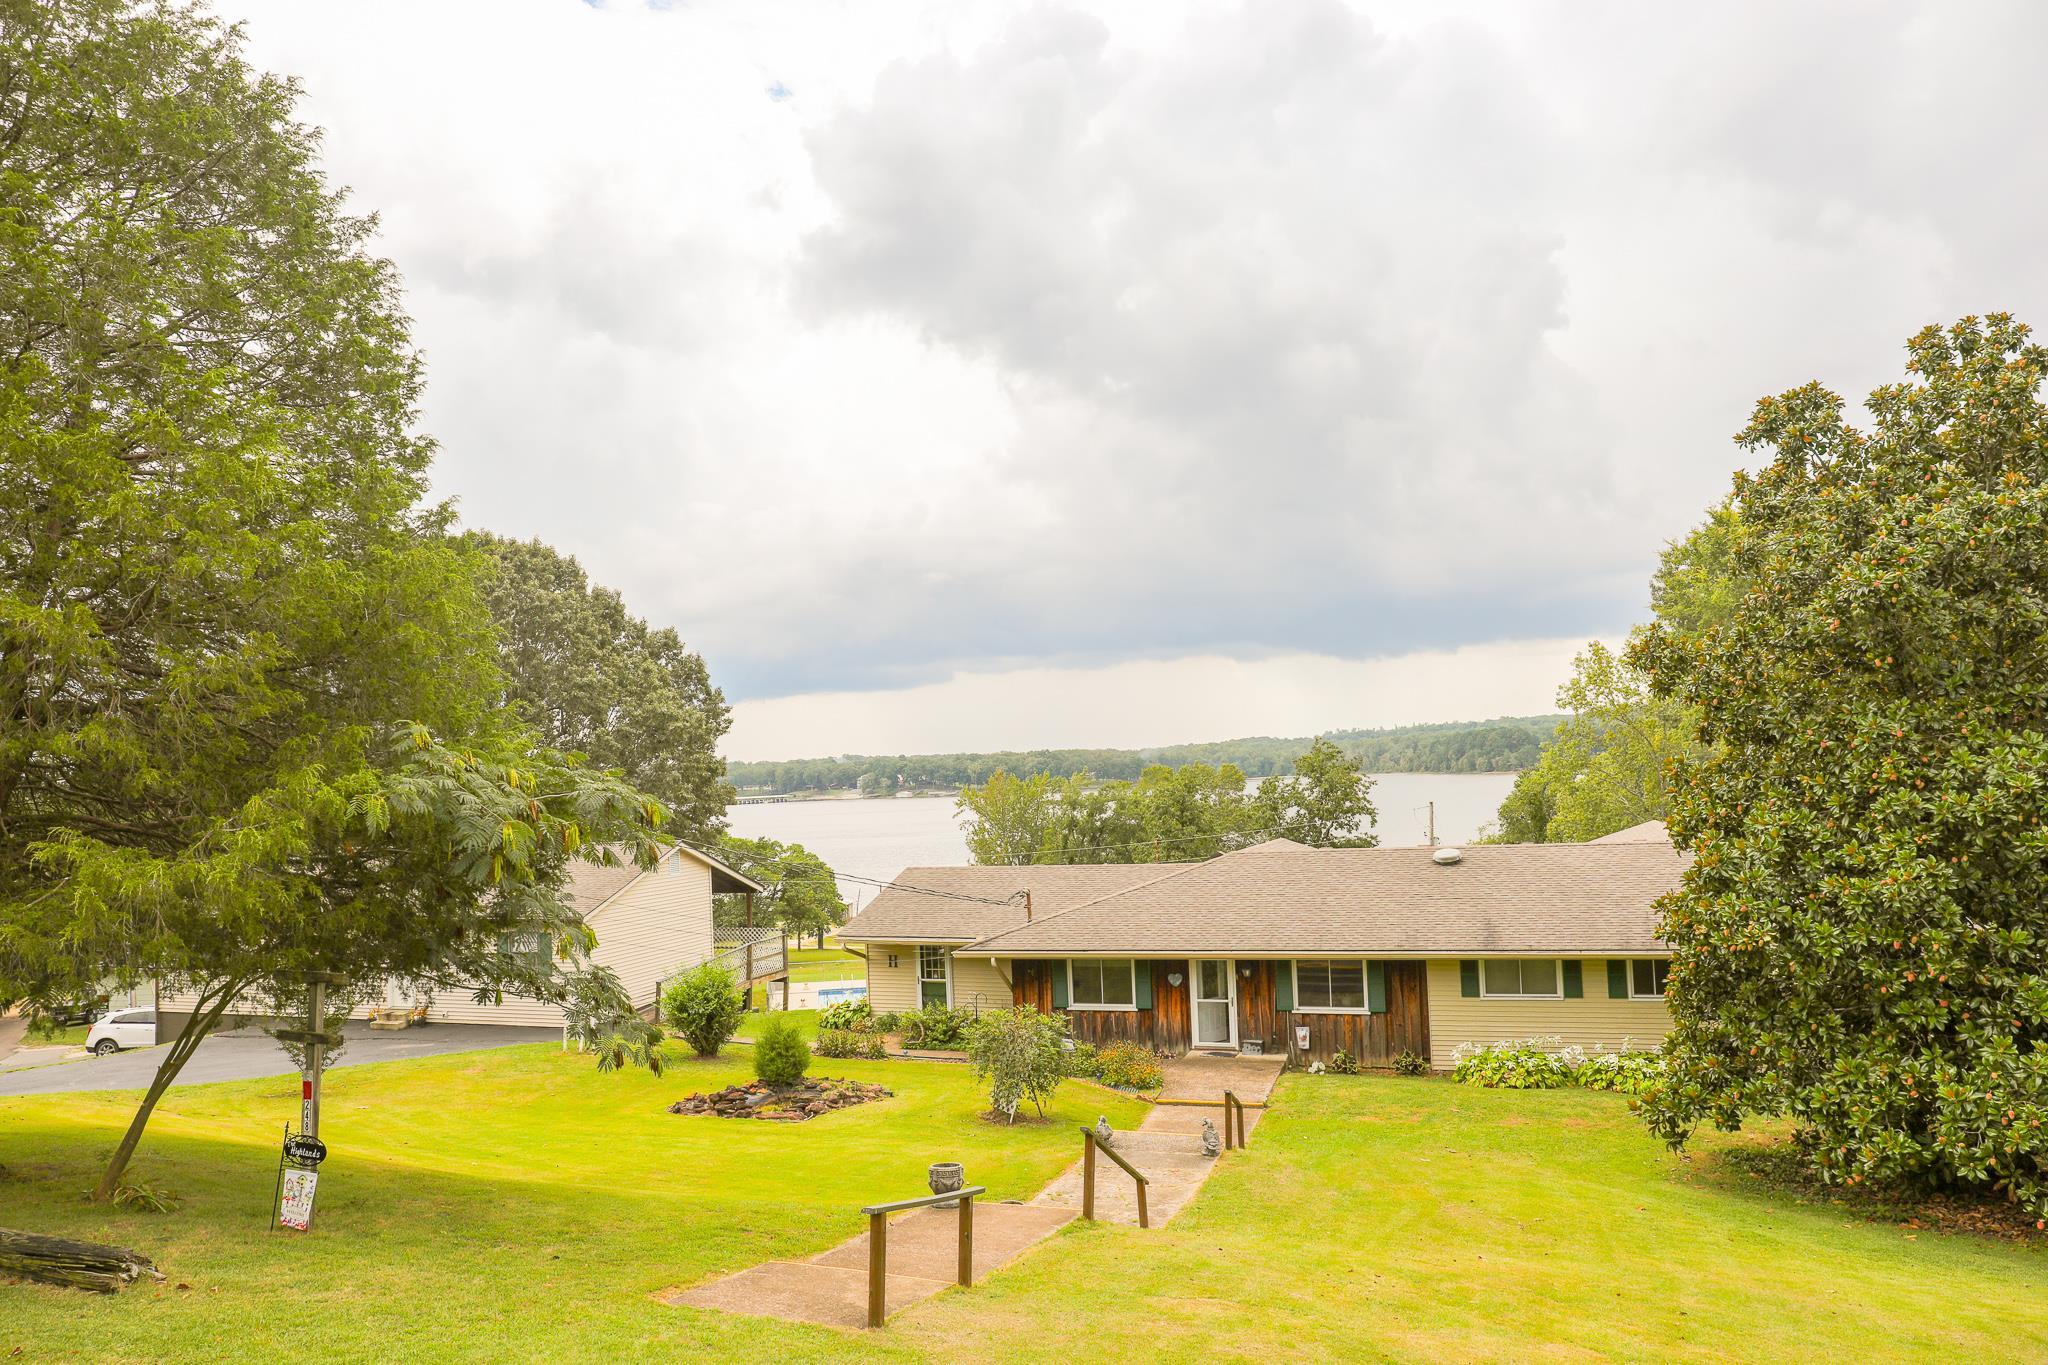 248 Oak Haven Rd, Buchanan, TN 38222 - Buchanan, TN real estate listing